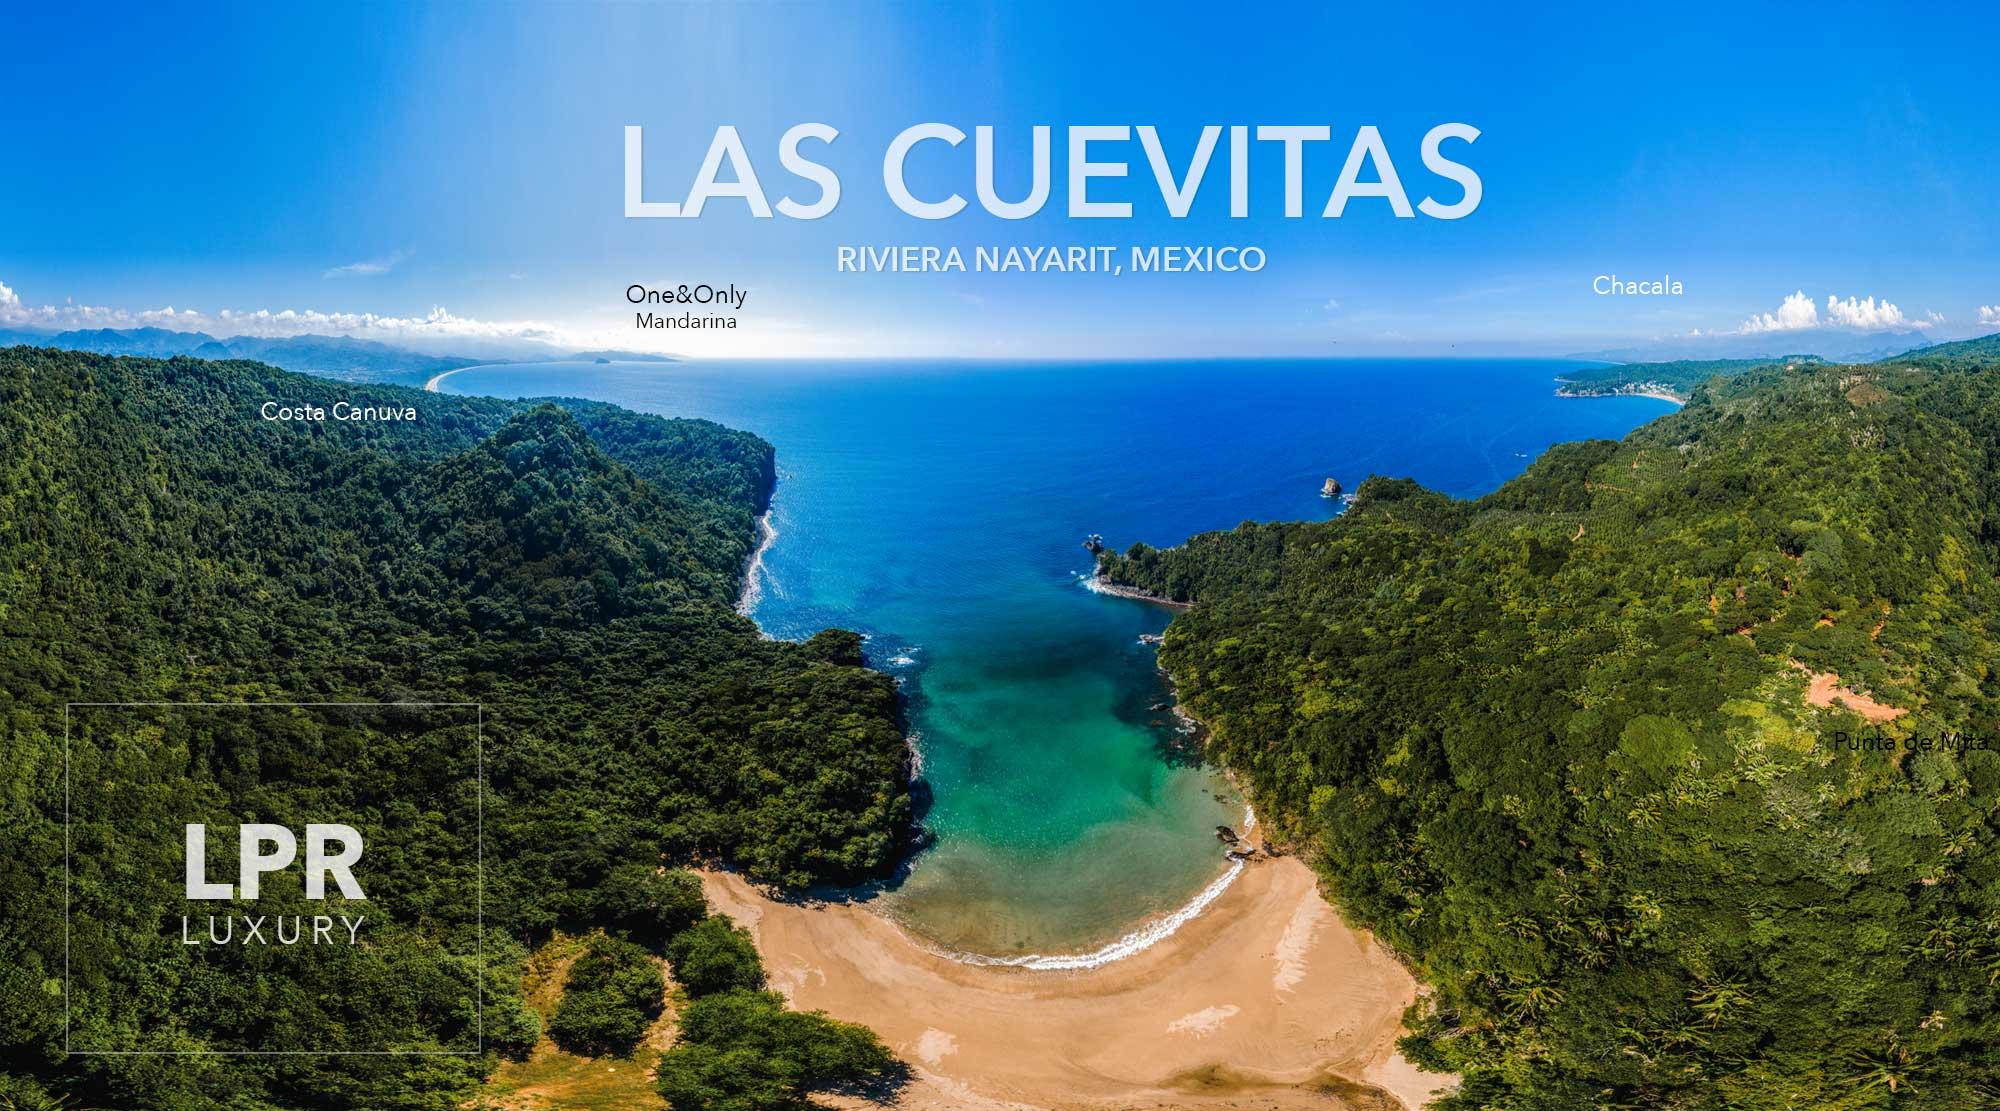 Playa Las Cuevitas - Costa Canuva - Riviera Nayarit, Mexico development land for sale - Luxury beachfront resort real estate